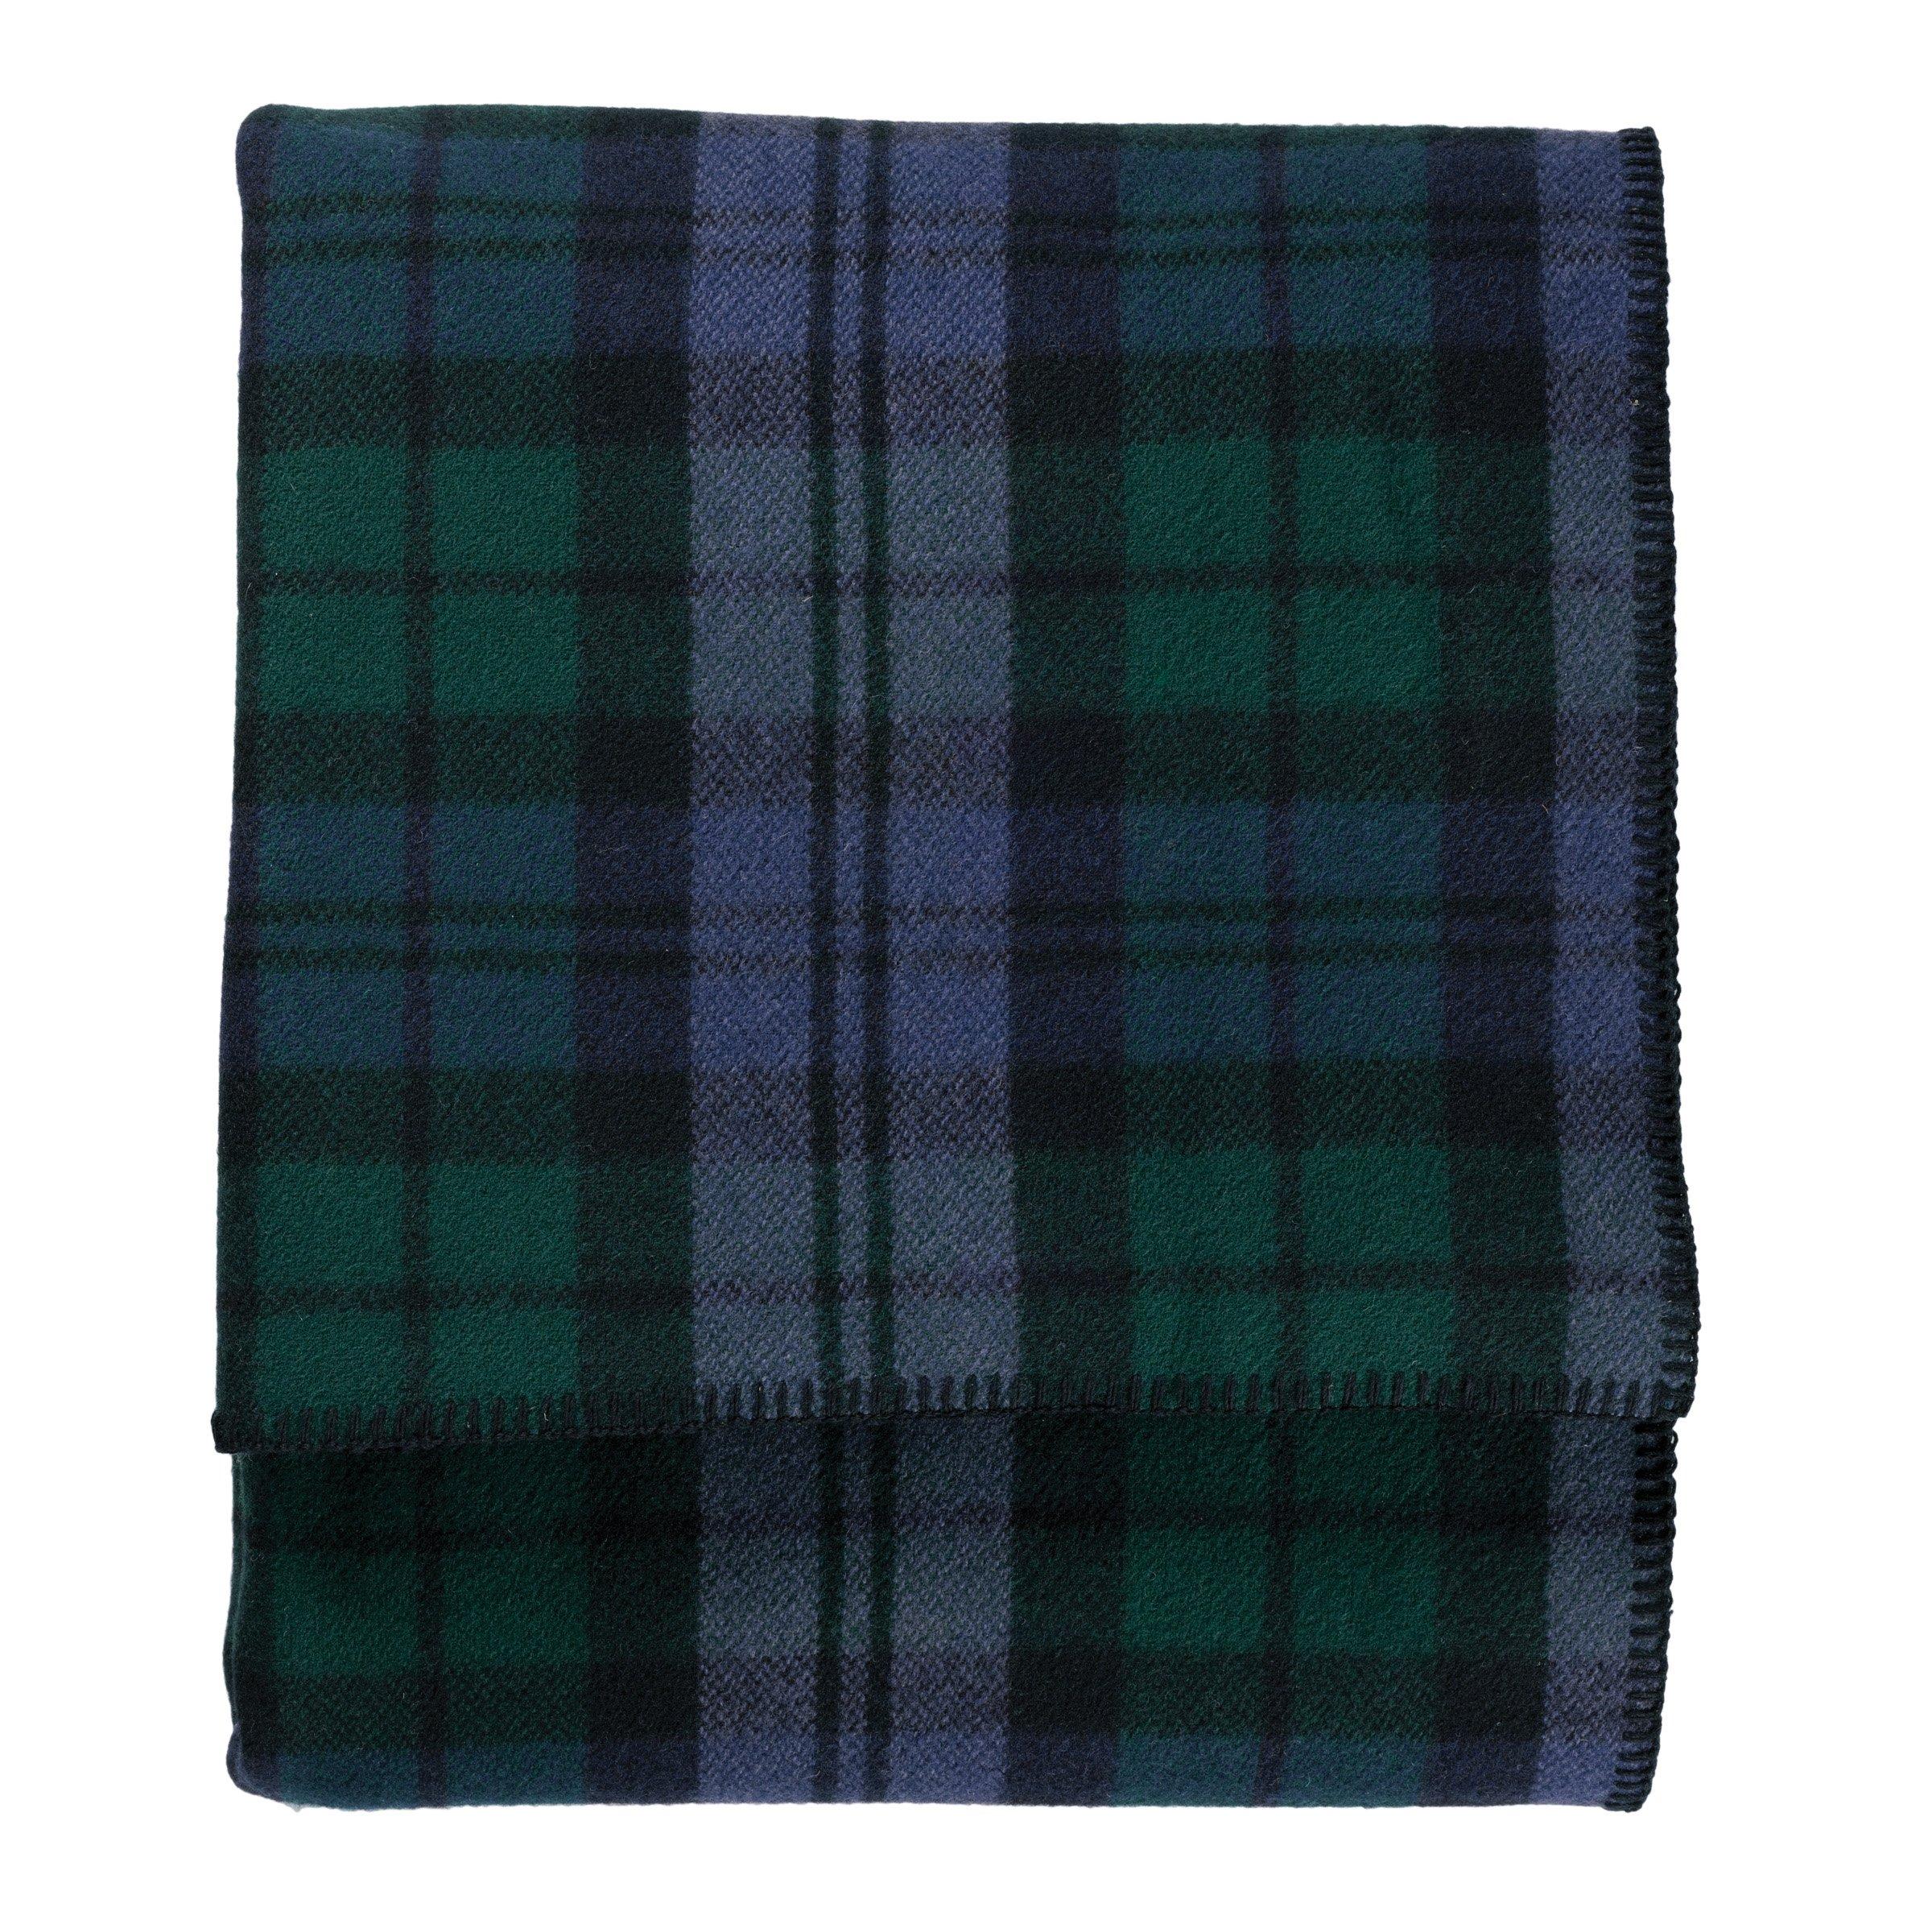 Pendleton Easy Care Bed Blanket, King, Black Watch